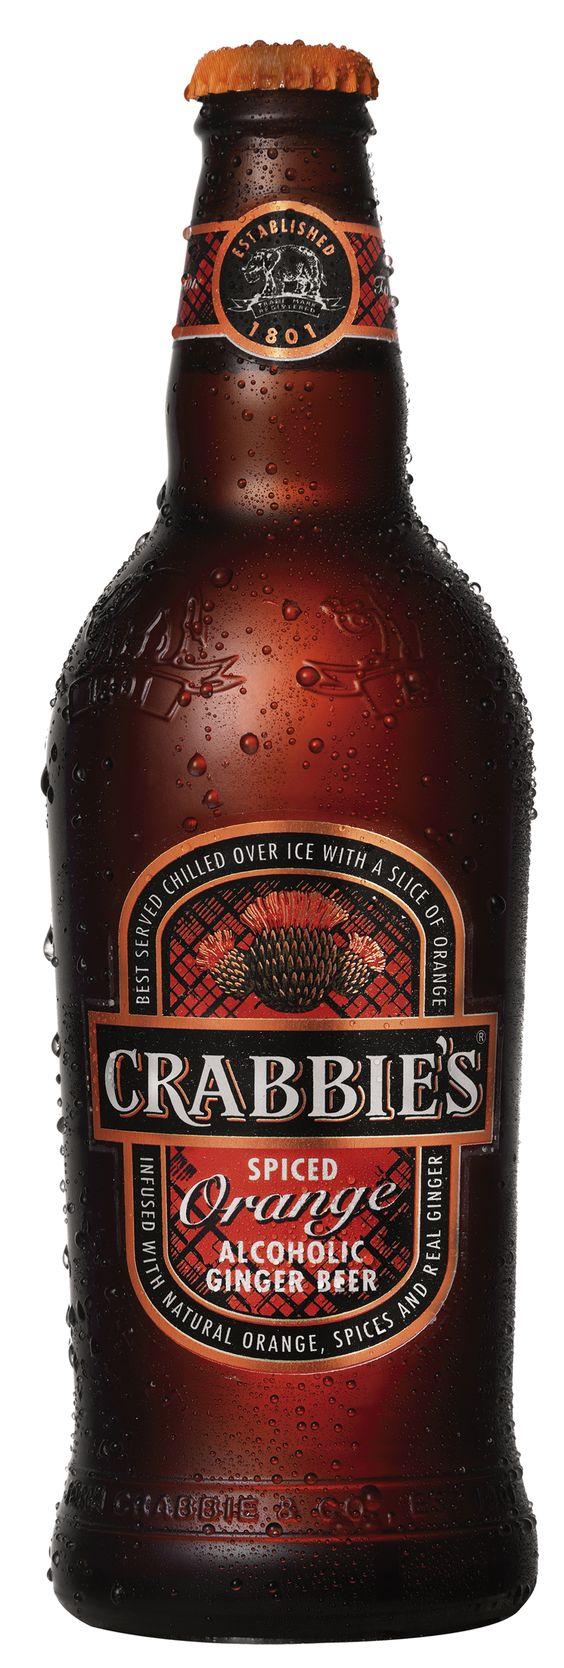 crabbies orange ginger beer review